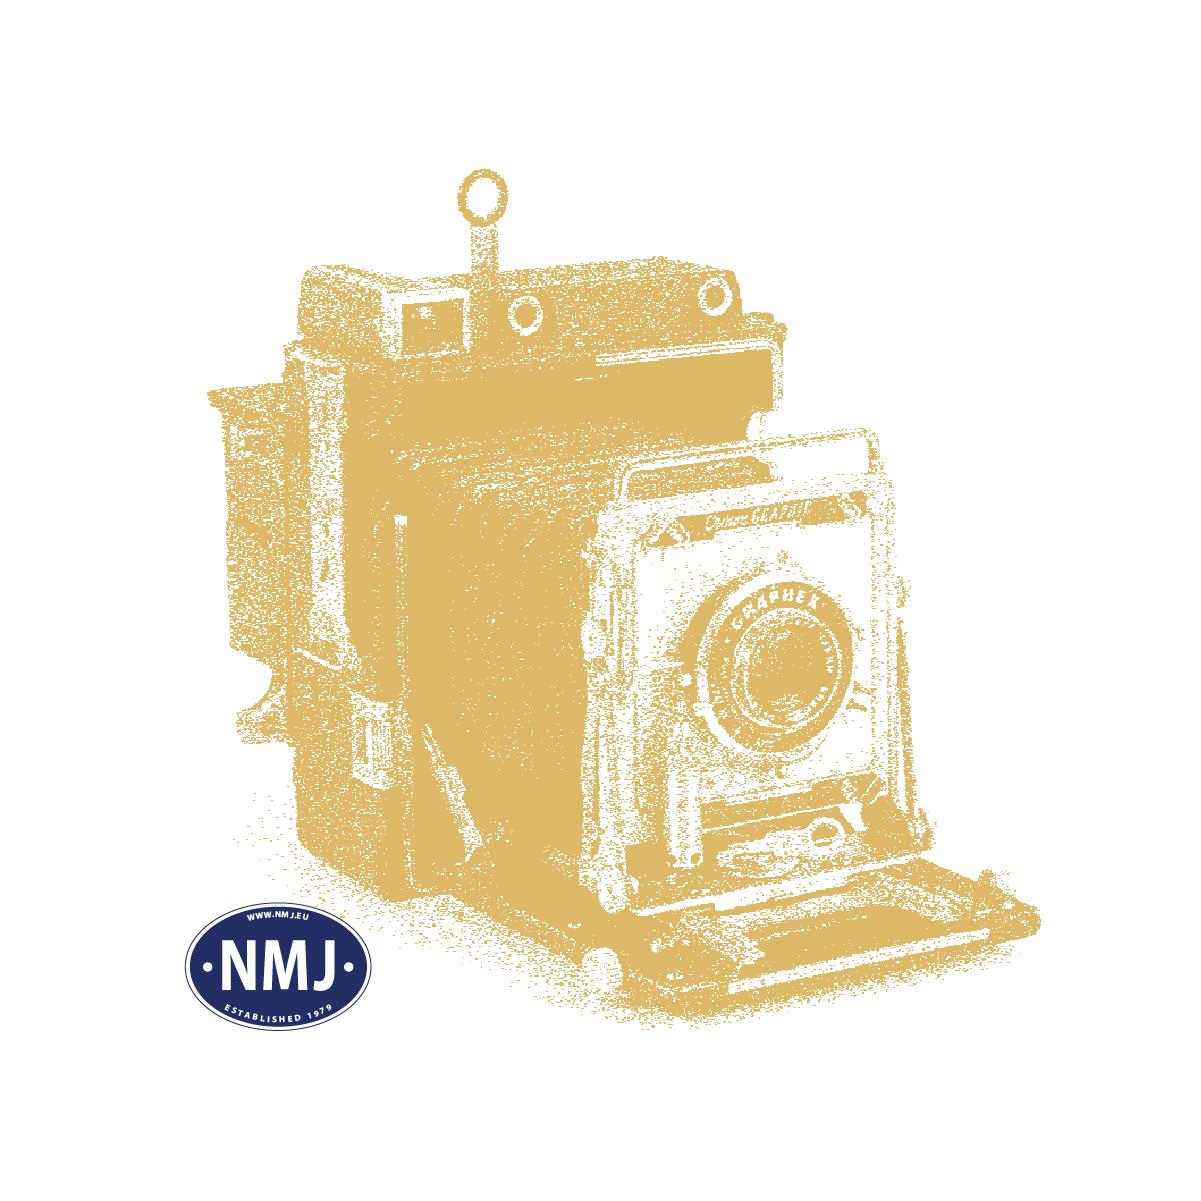 WODC1188 - No-news Paper